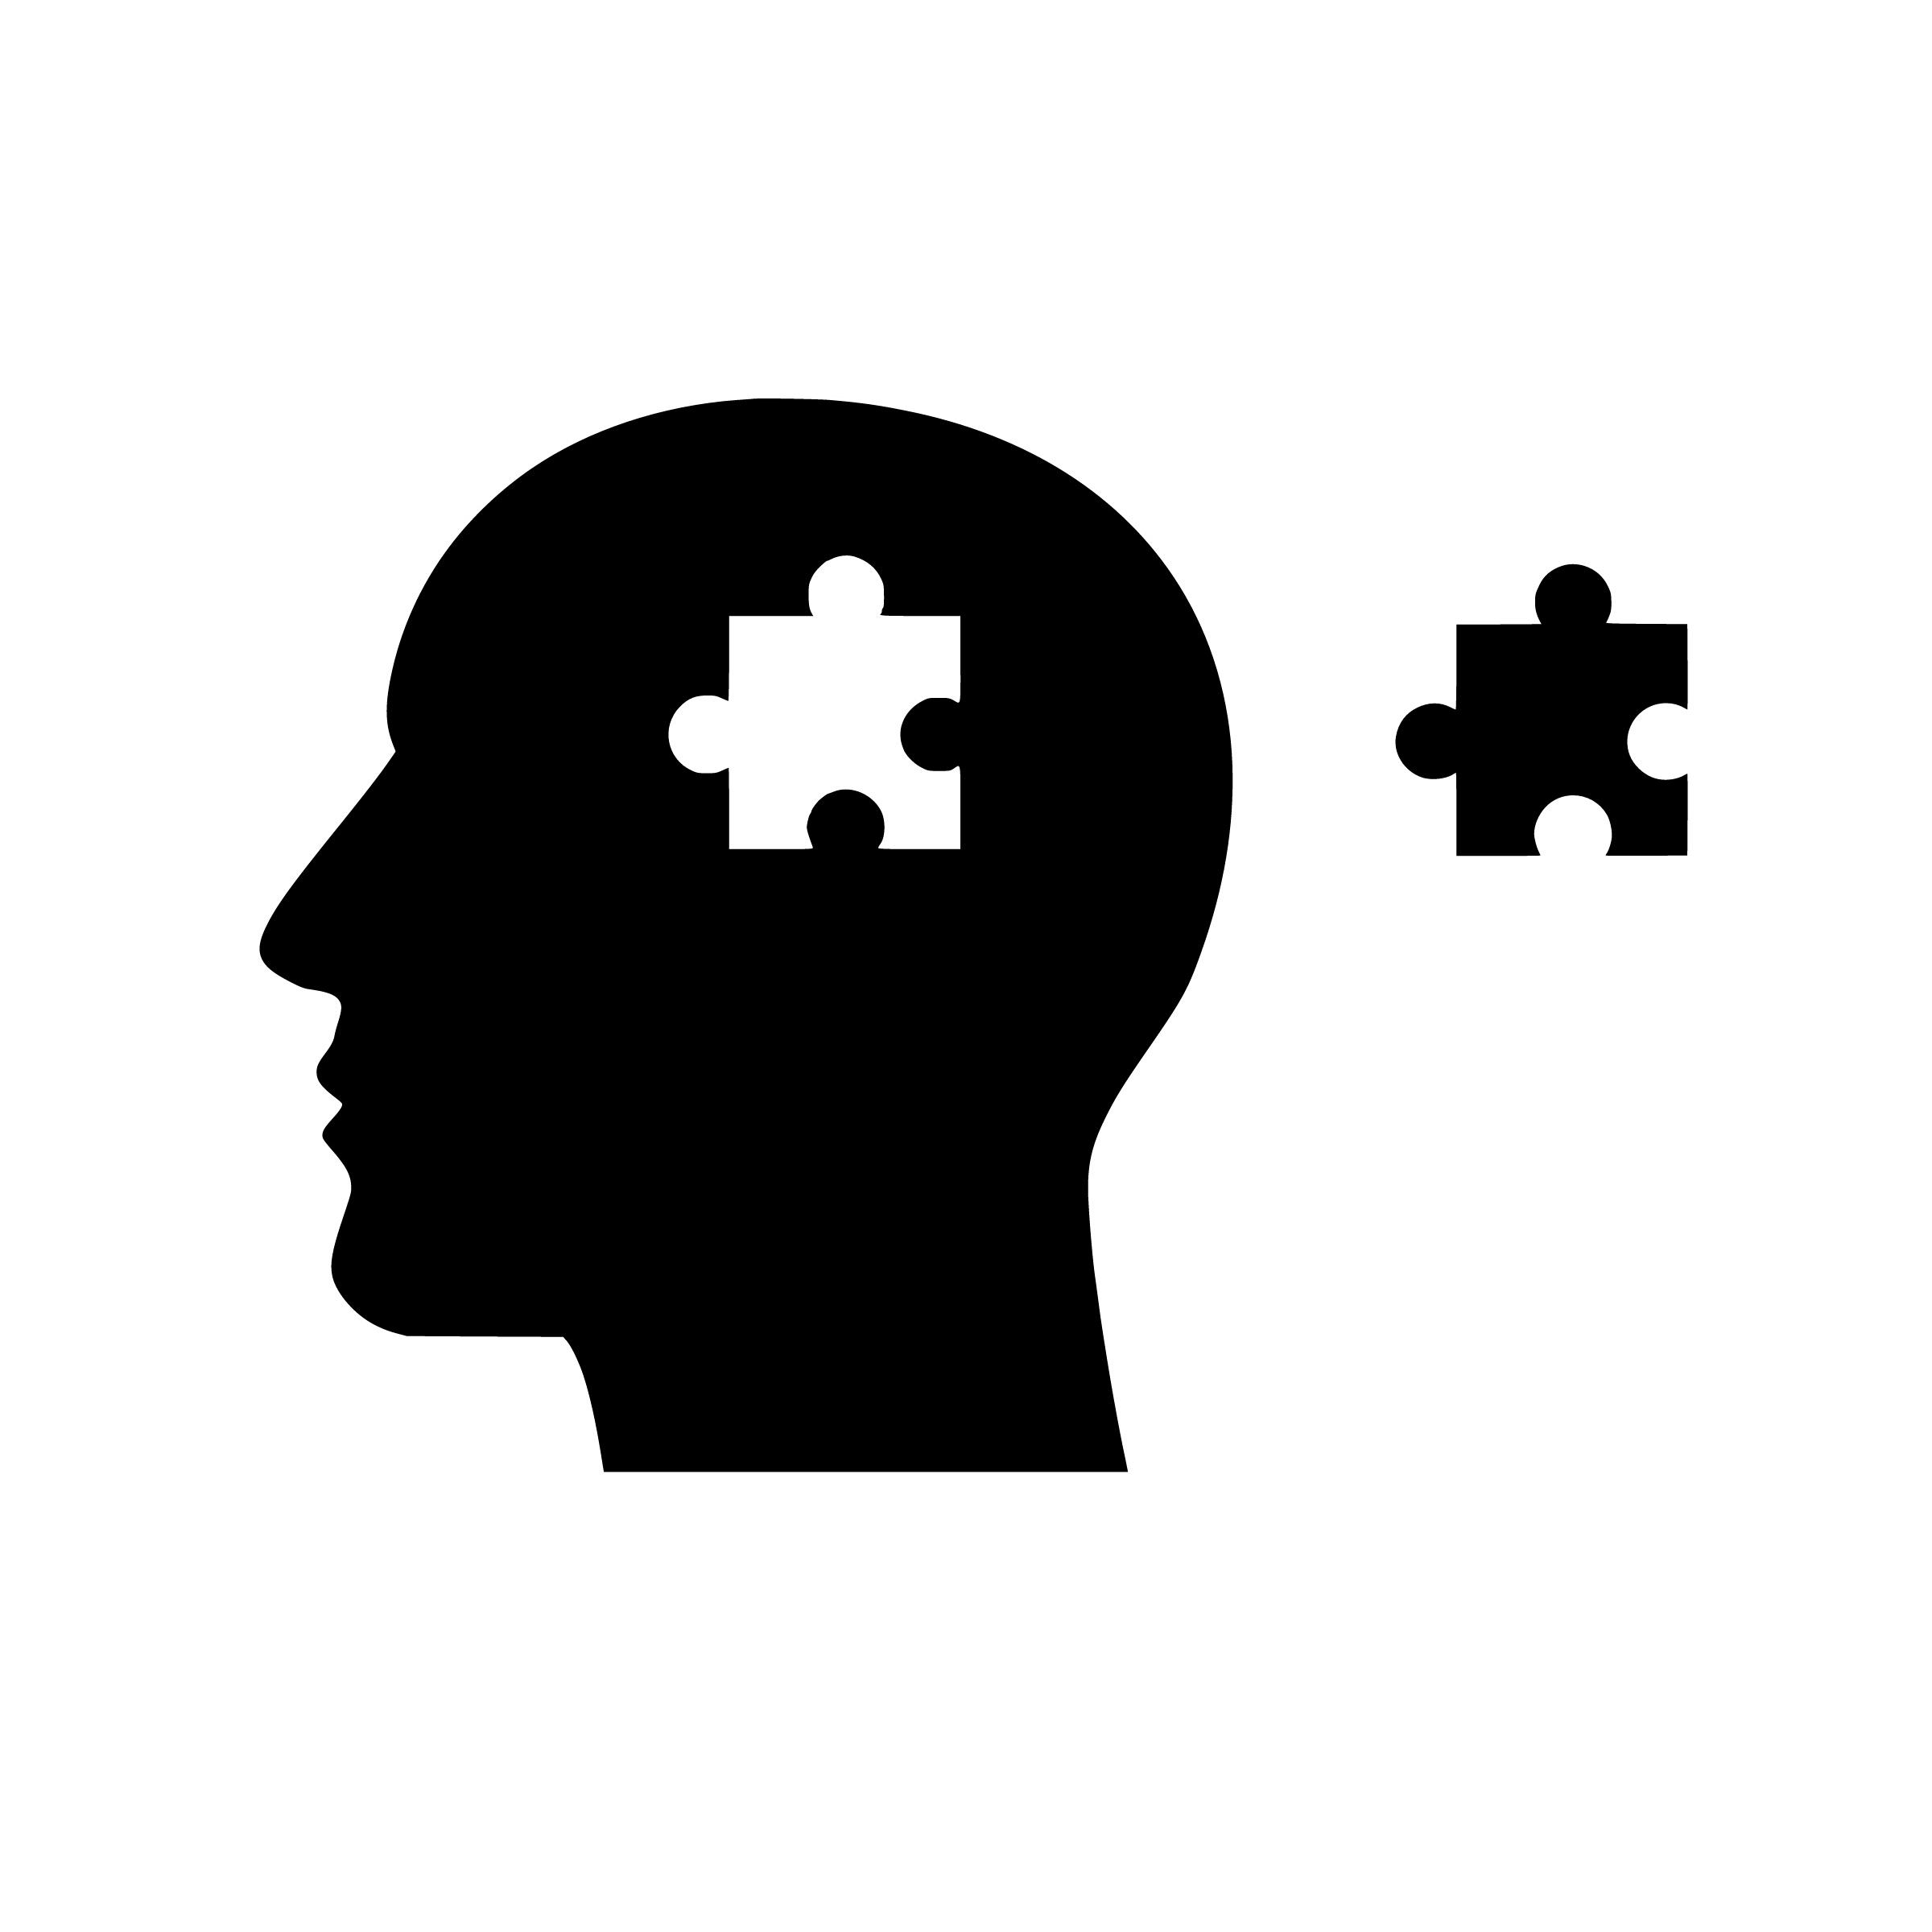 free images silhouette  brain  logic  mental health brain clipart free brain clipart cartoon